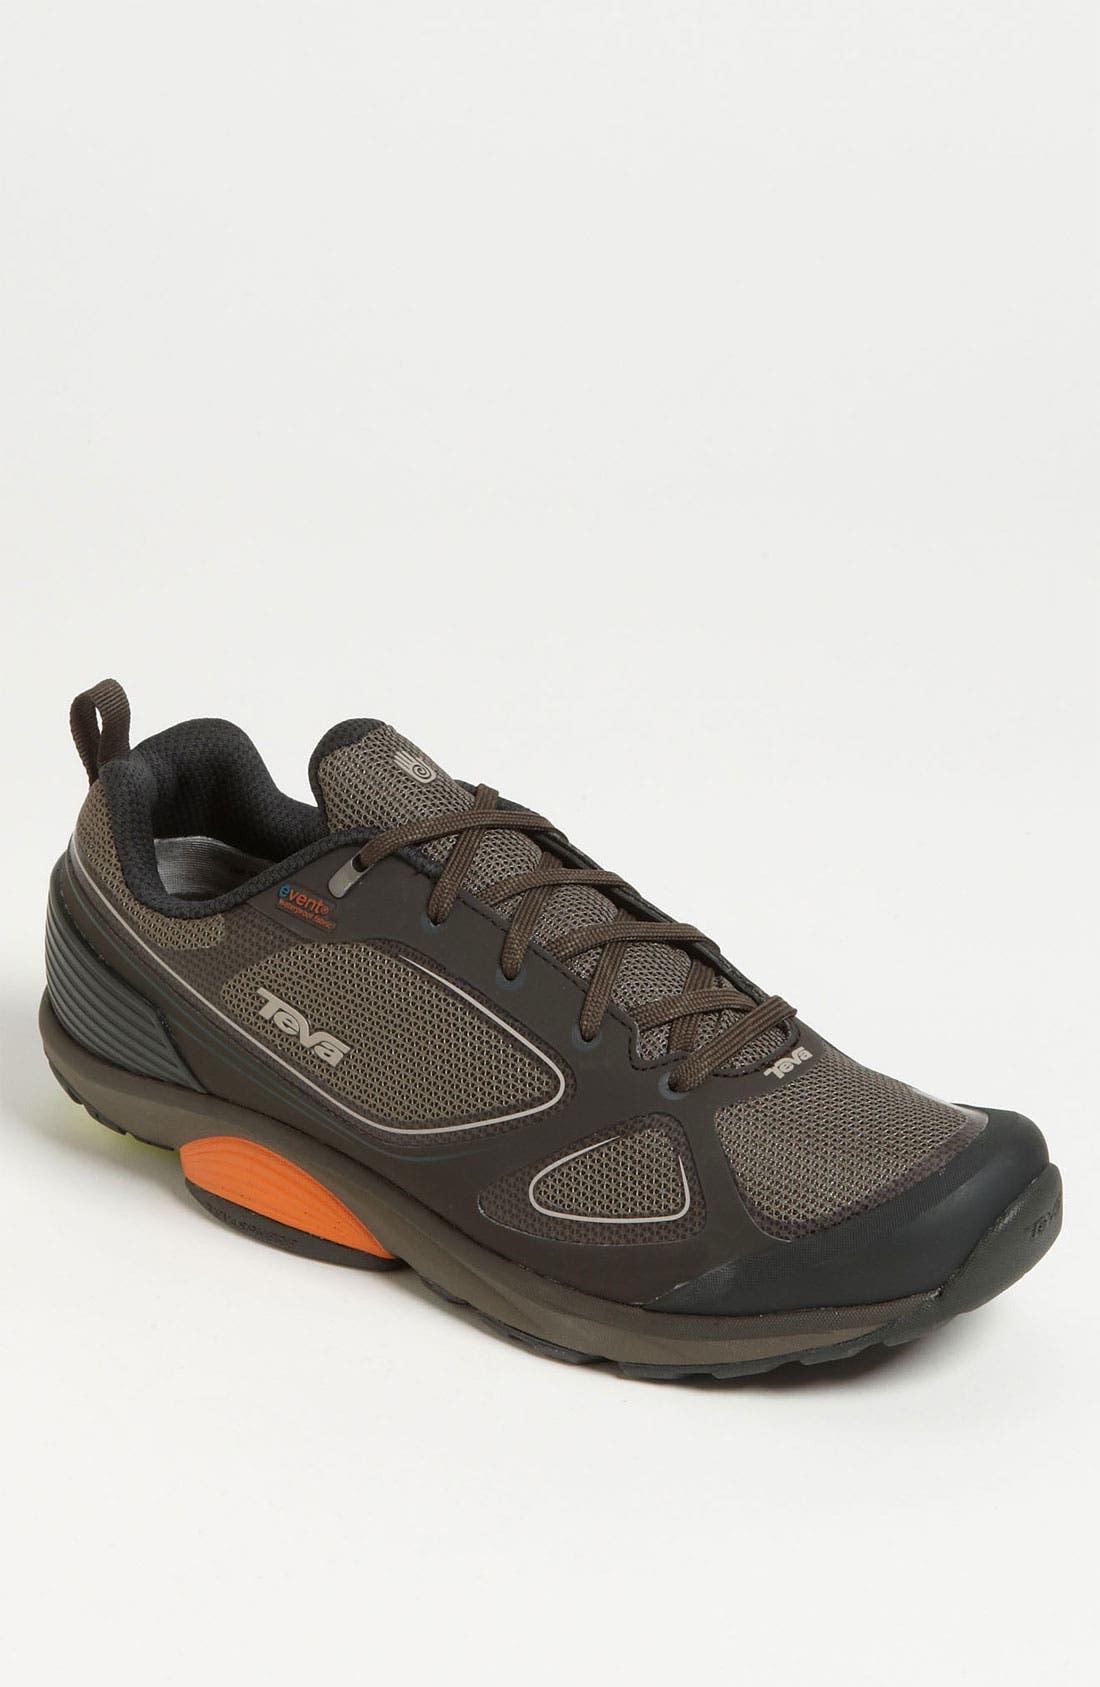 Alternate Image 1 Selected - Teva 'TevaSphere Trail' Training Shoe (Men)